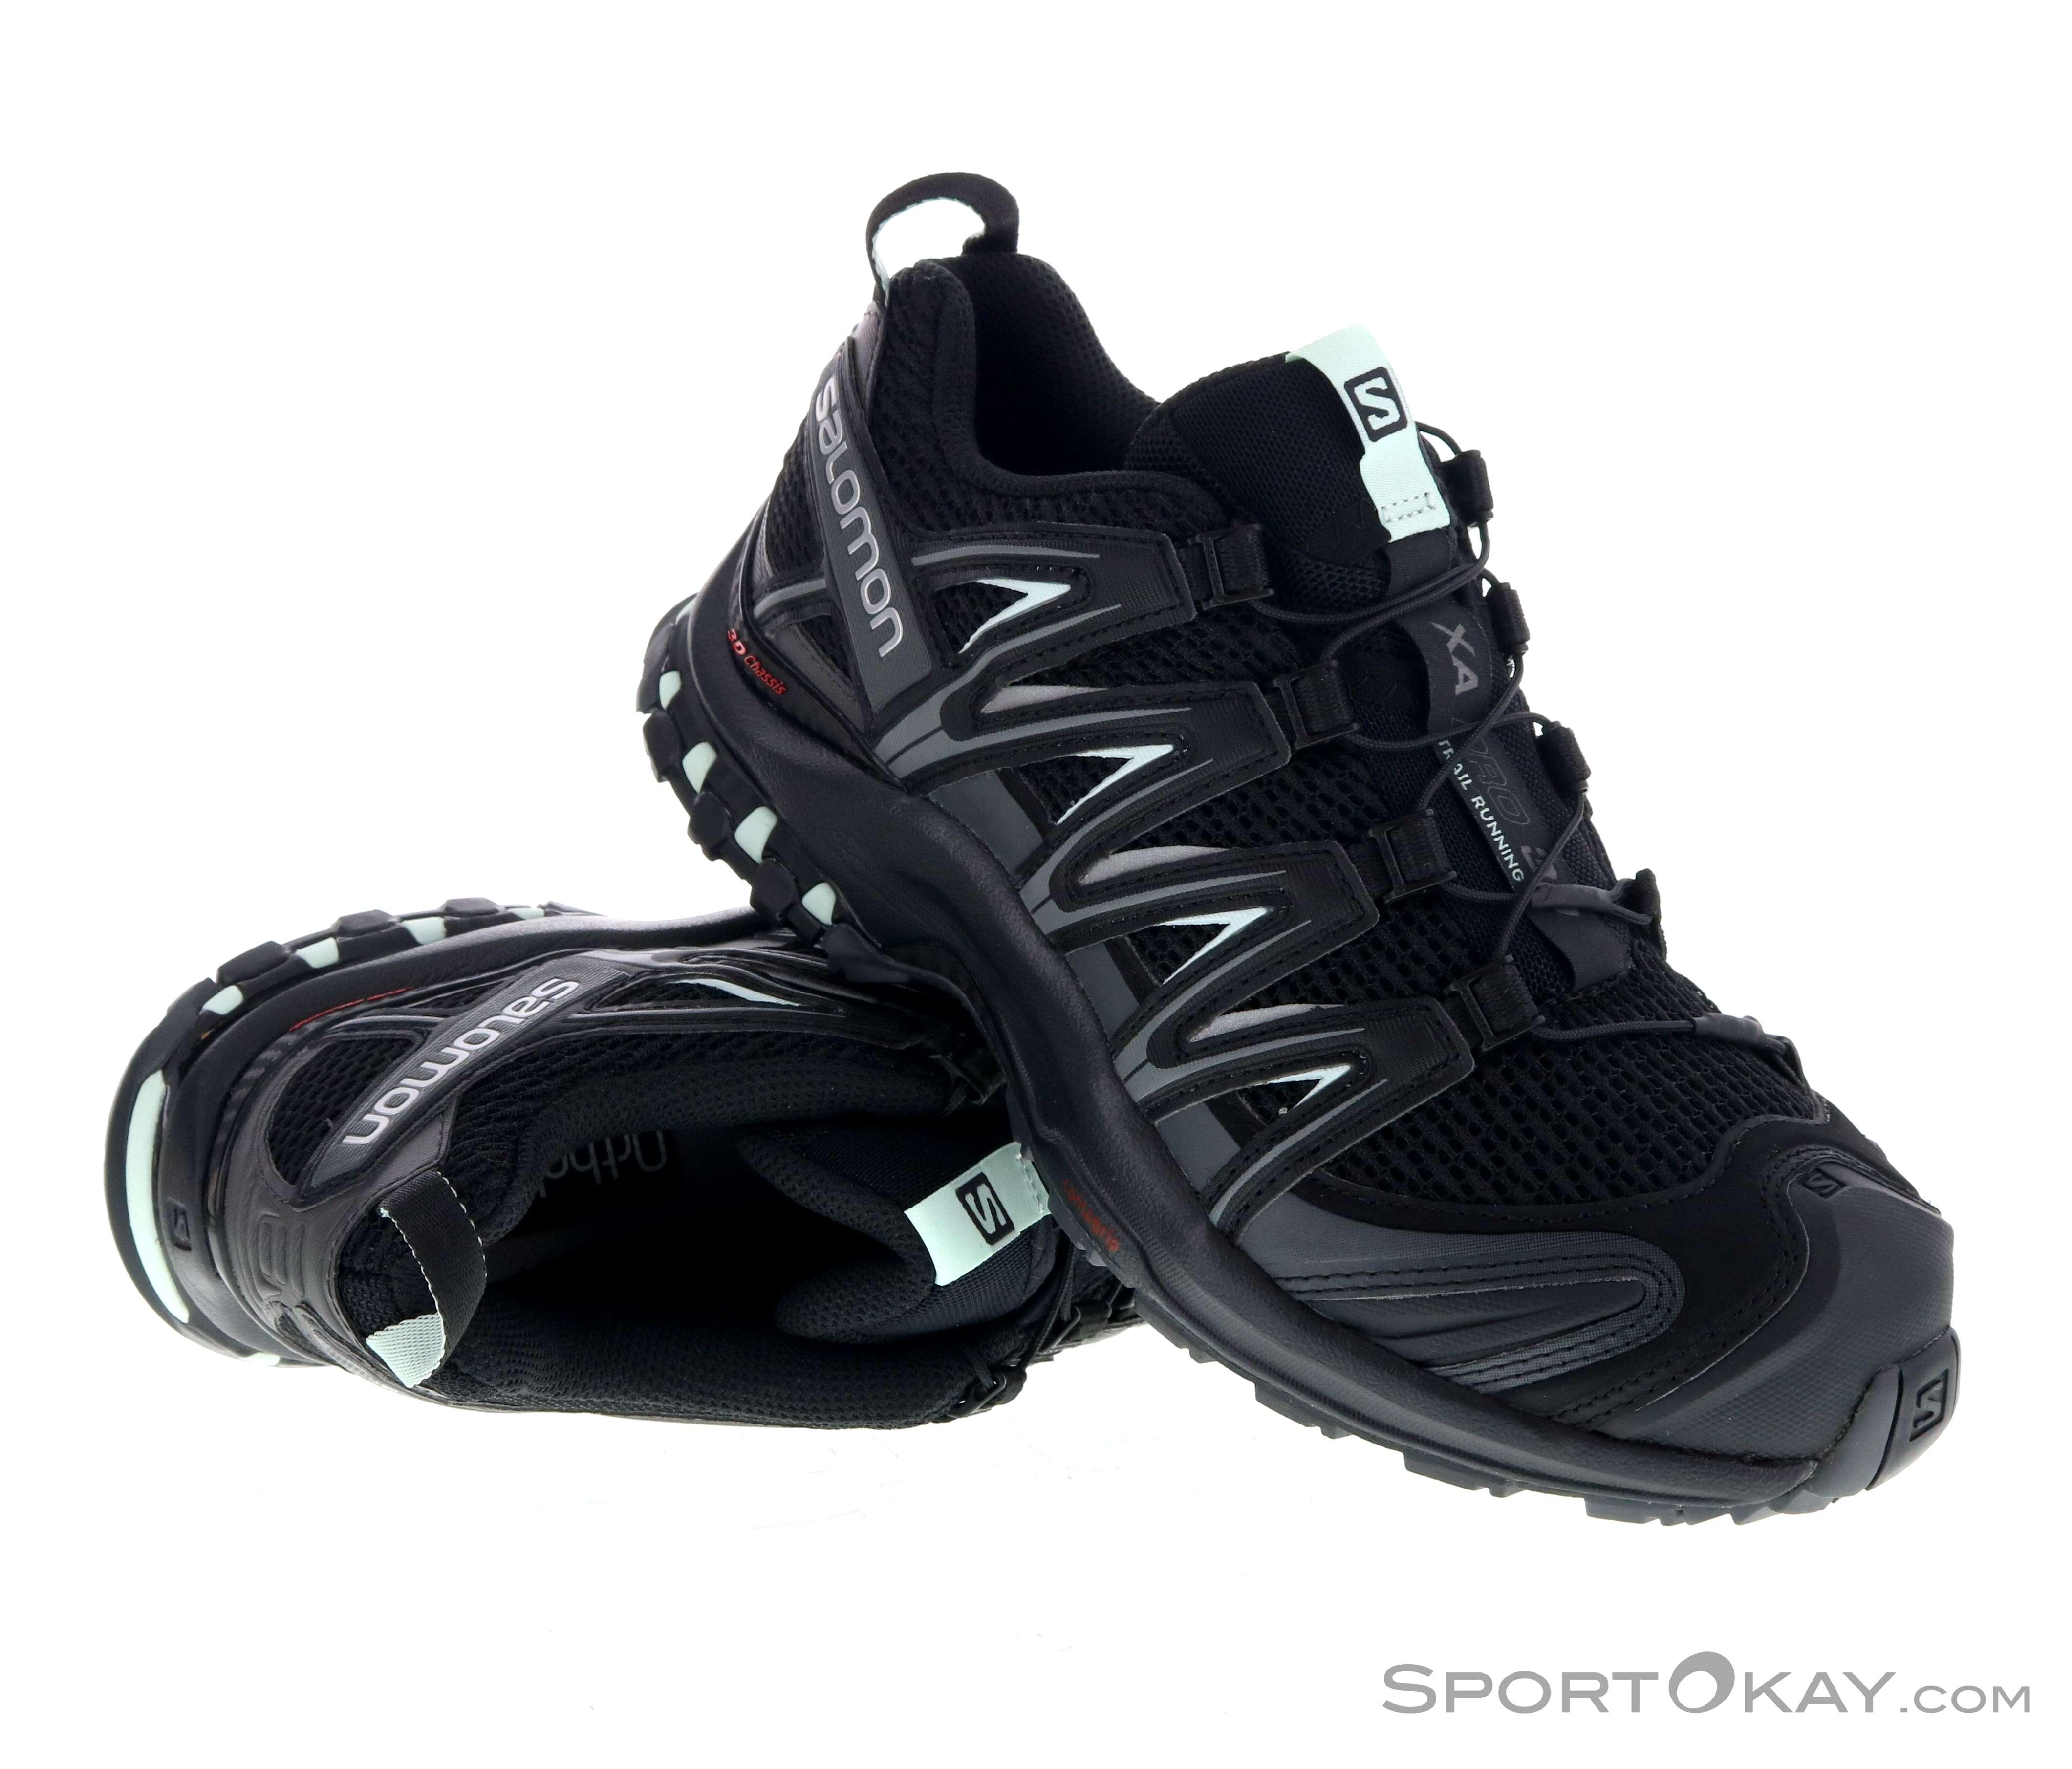 Salomon Salomon XA Pro 3D Womens Trail Running Shoes